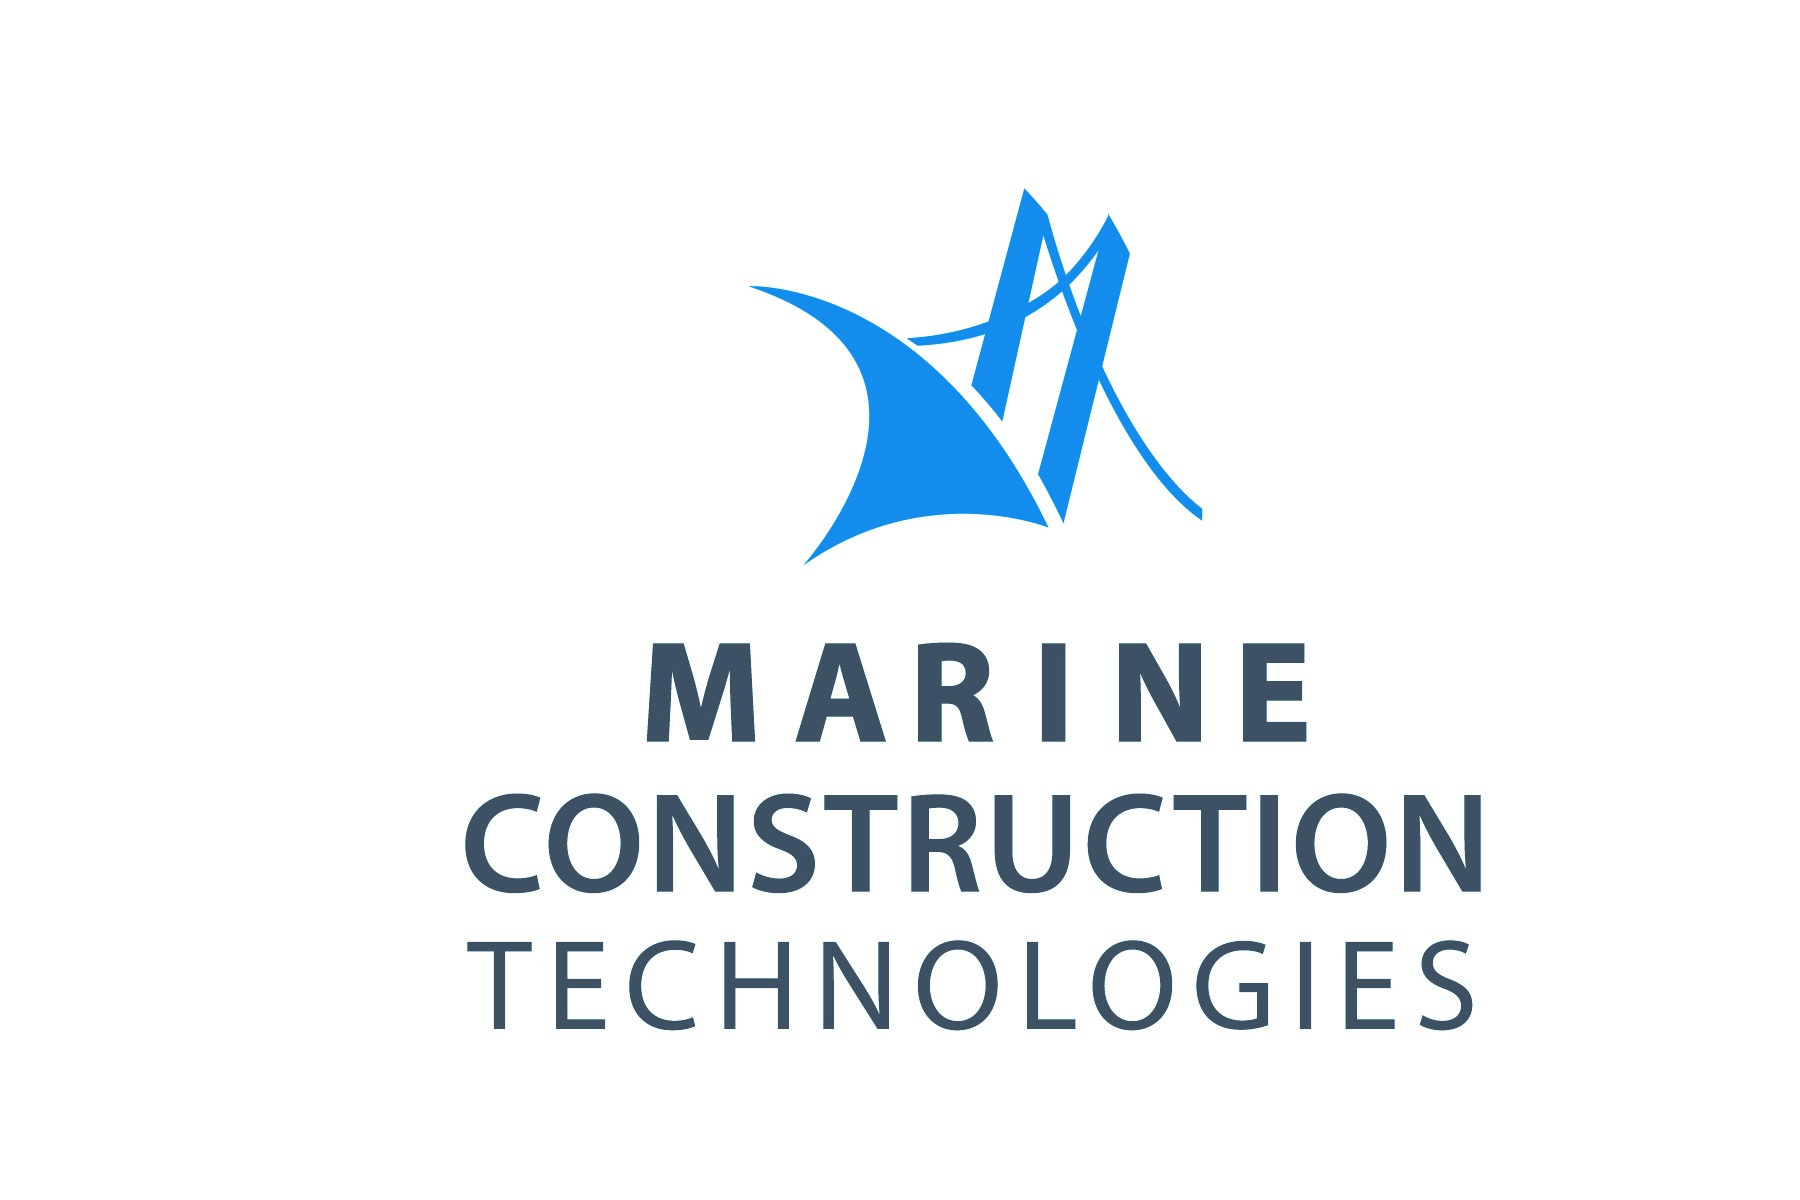 Marine Construction Technologies Block.jpg